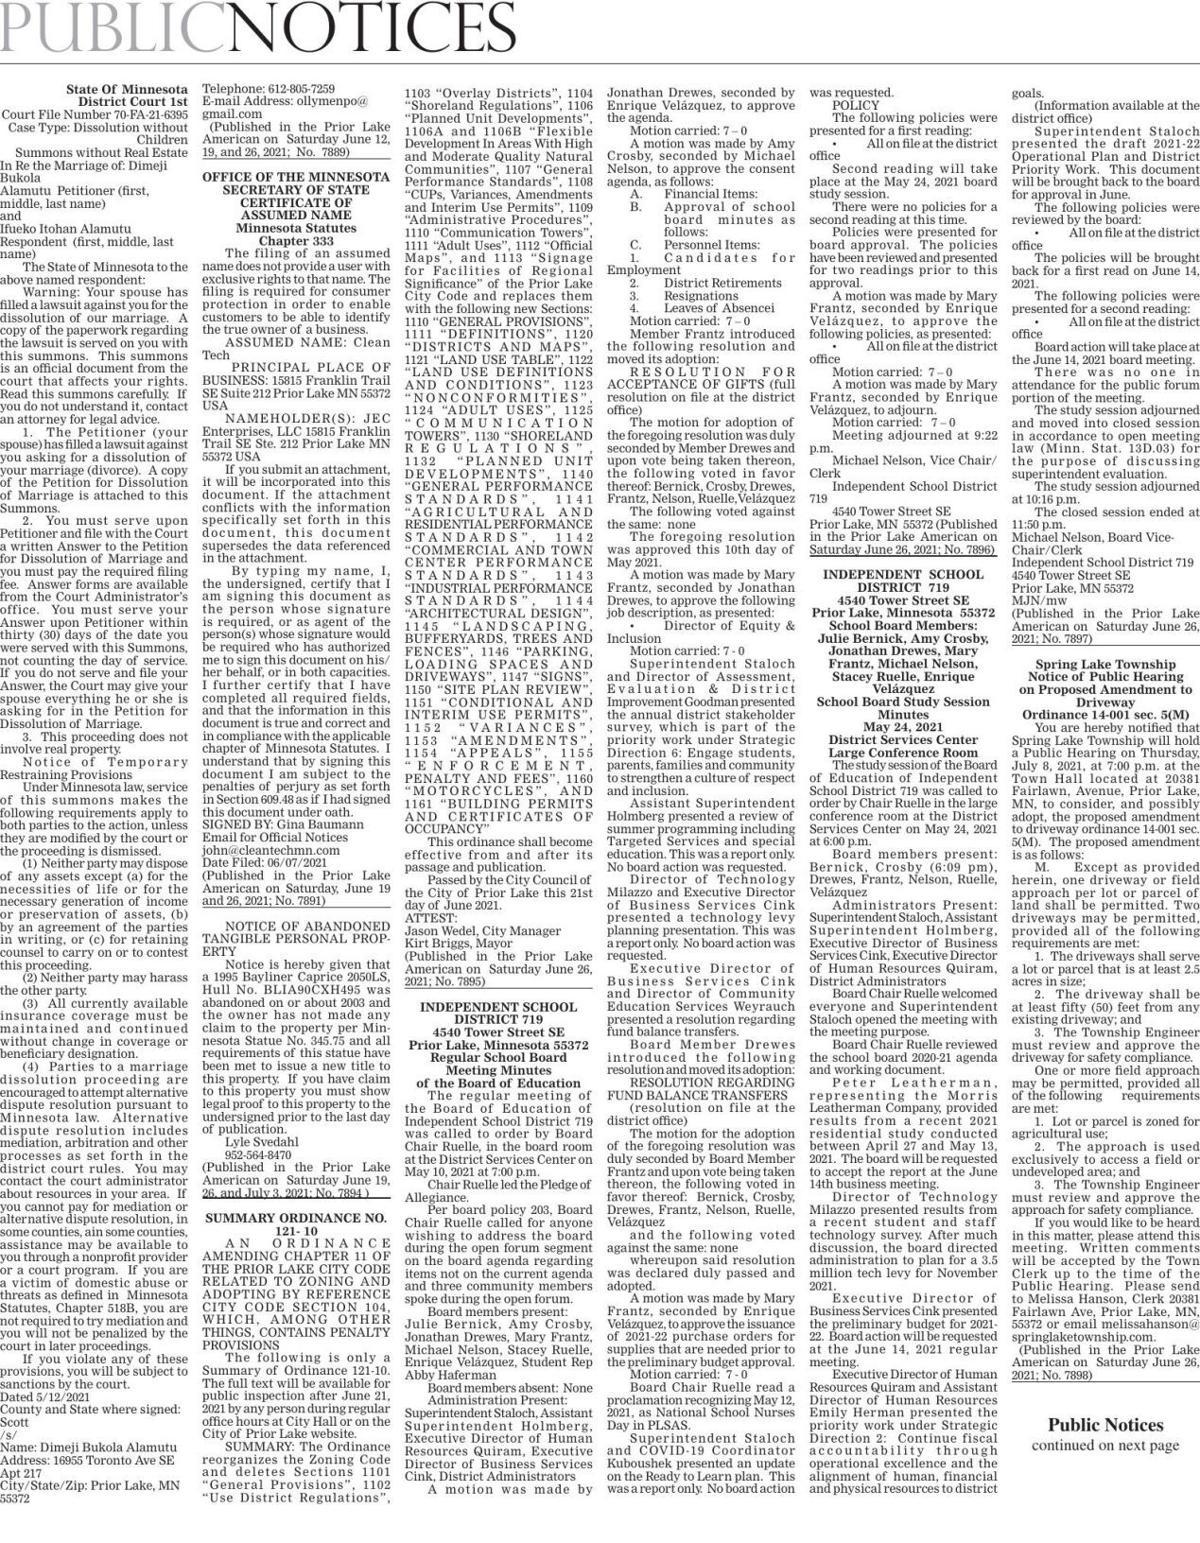 Public Notices from Saturday June 26, 2021 Prior Lake American